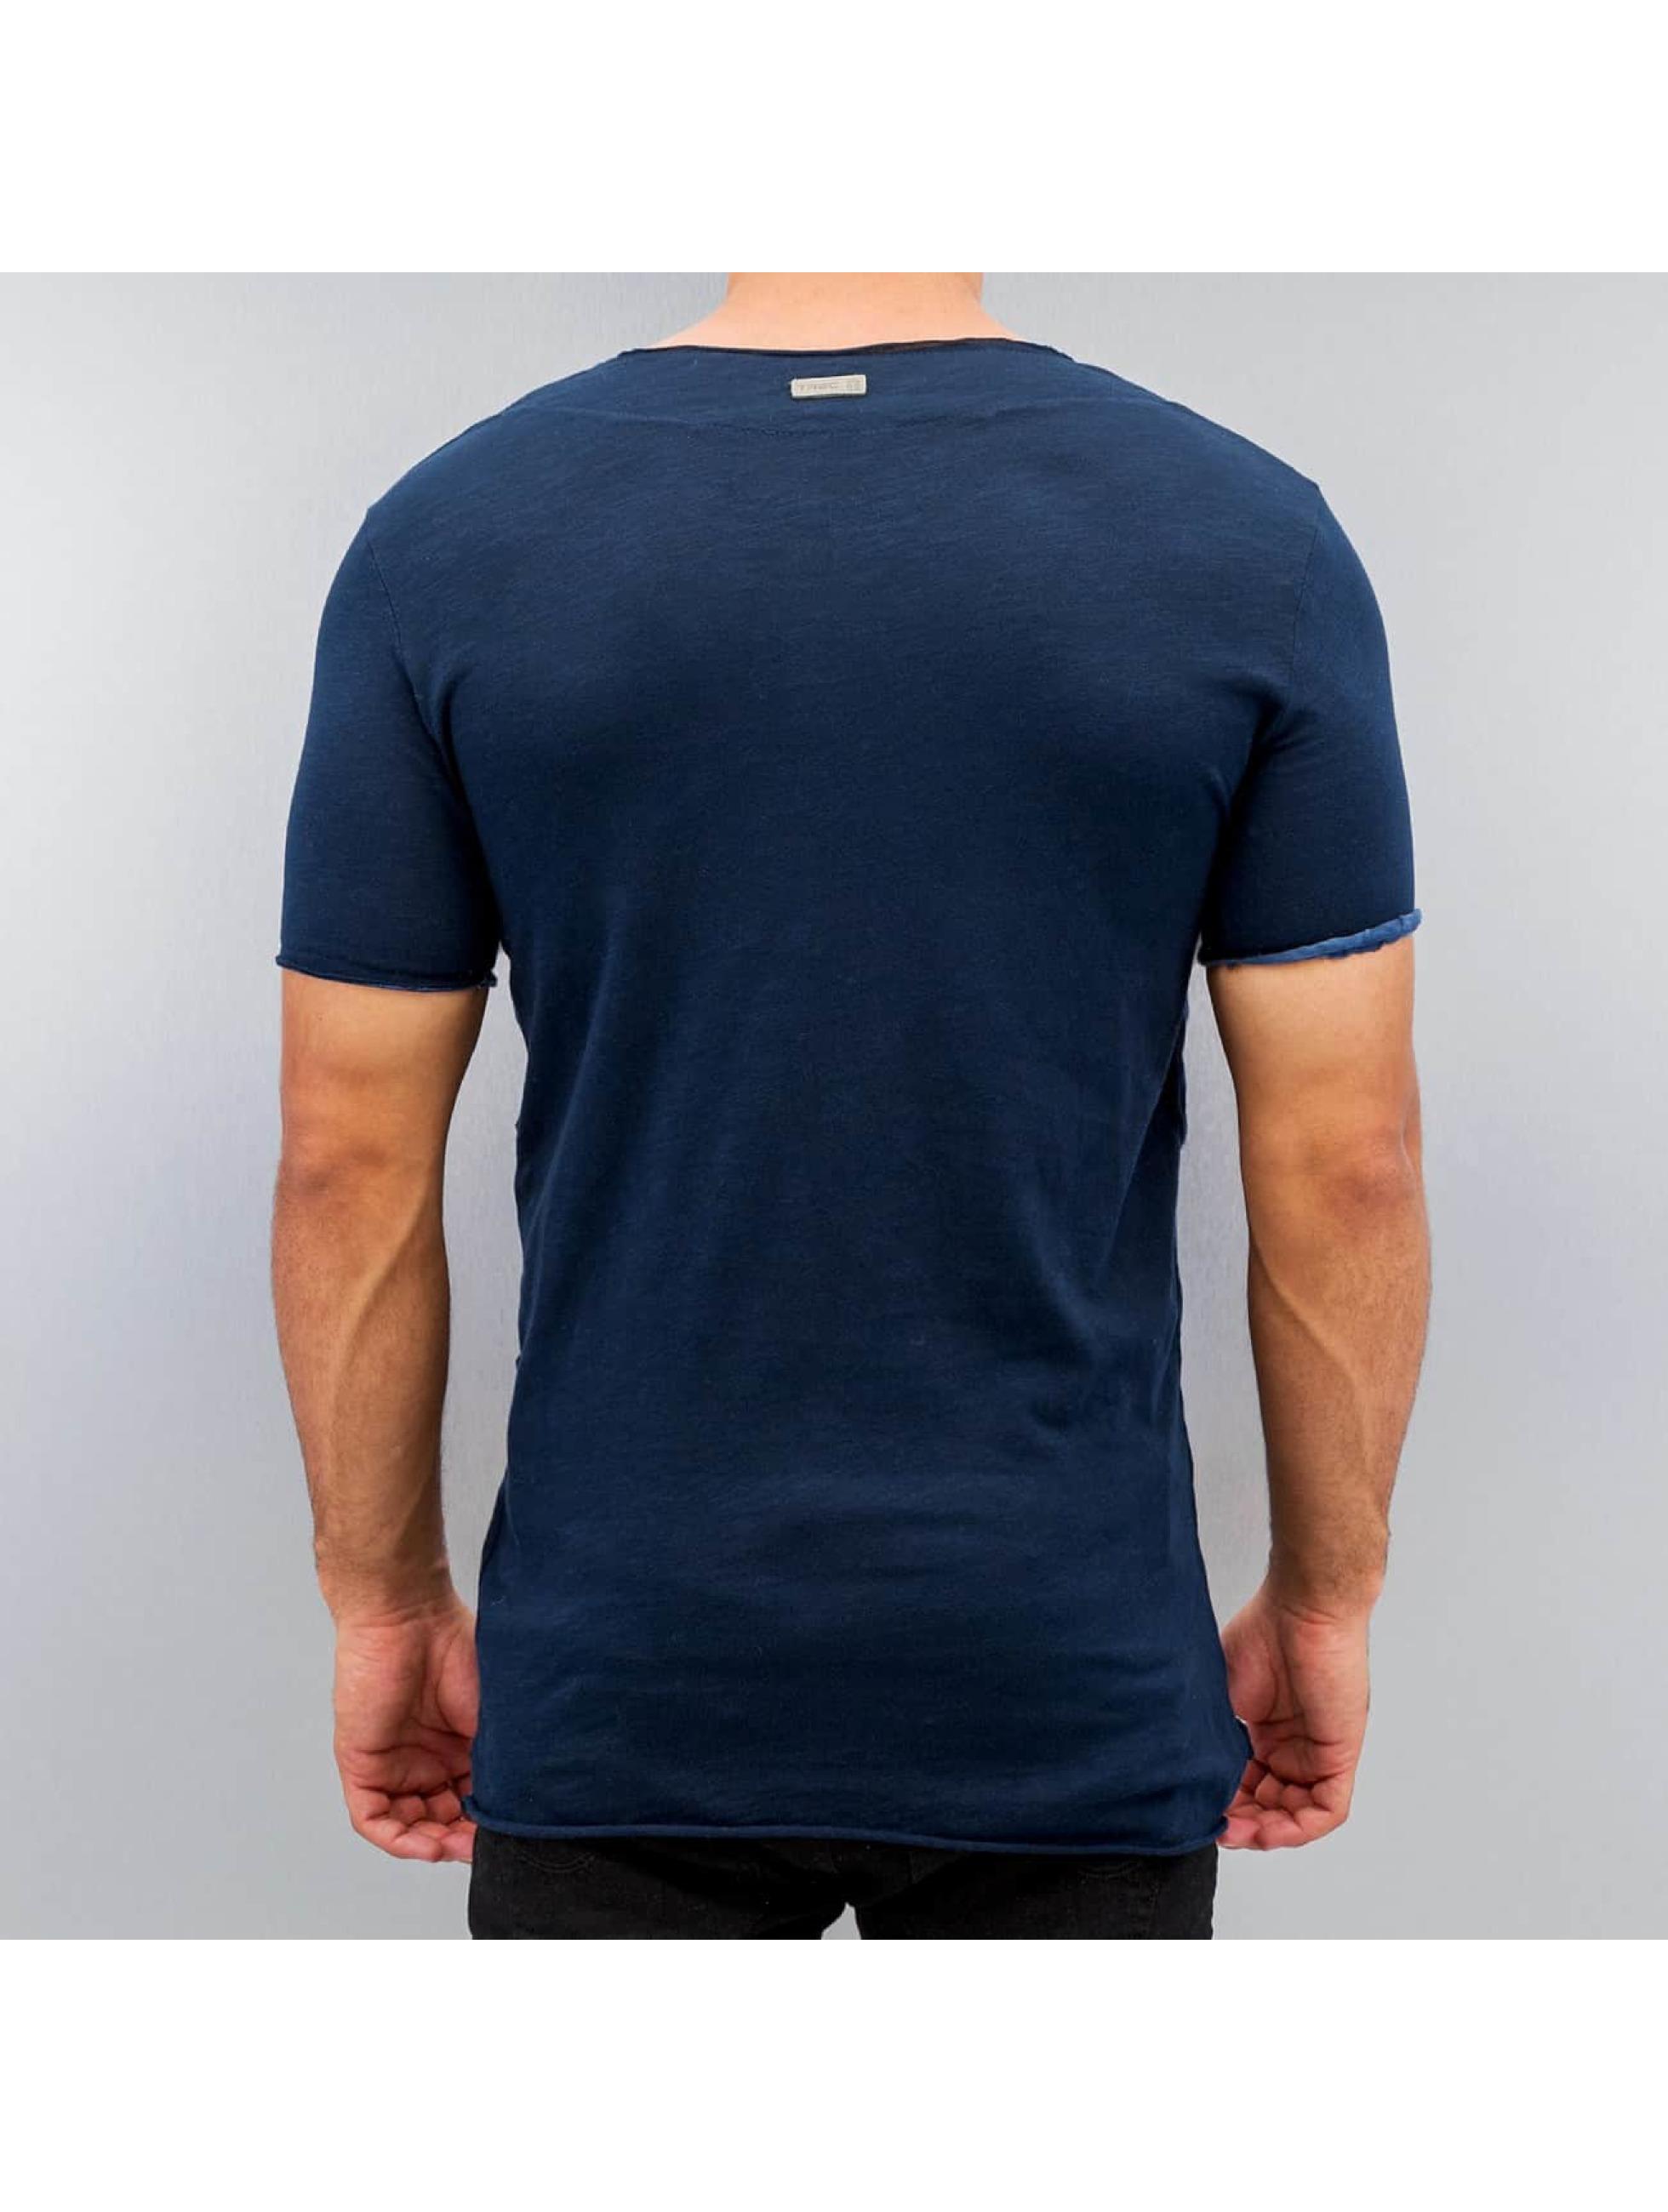 Red Bridge T-Shirt Destroyed Vintage blau